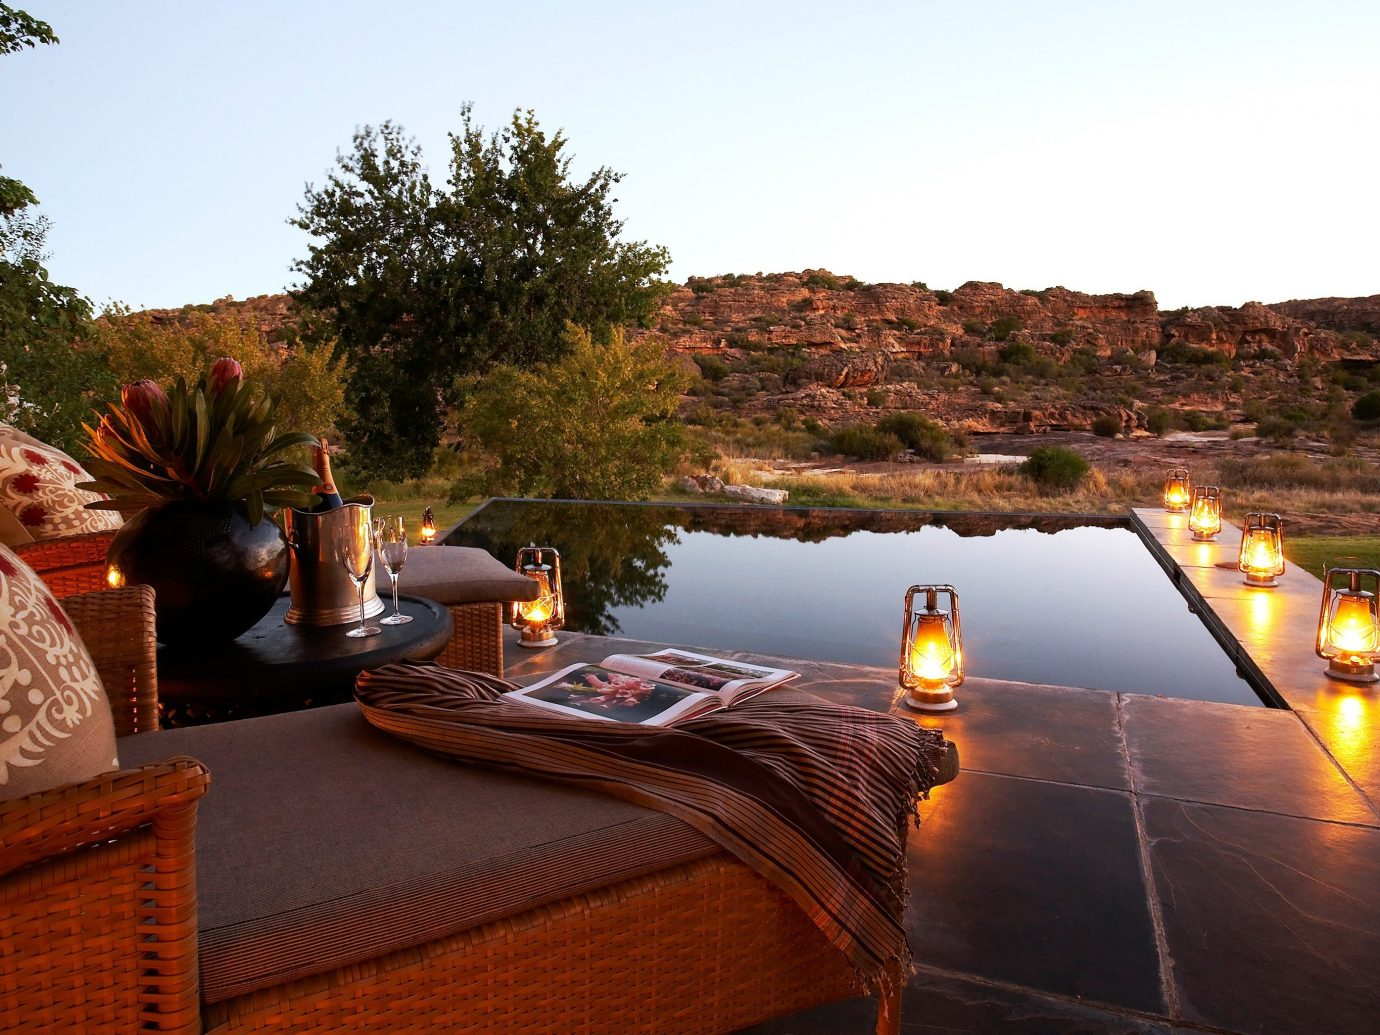 Hotels Outdoors + Adventure sky outdoor property swimming pool estate vacation Resort home Villa backyard